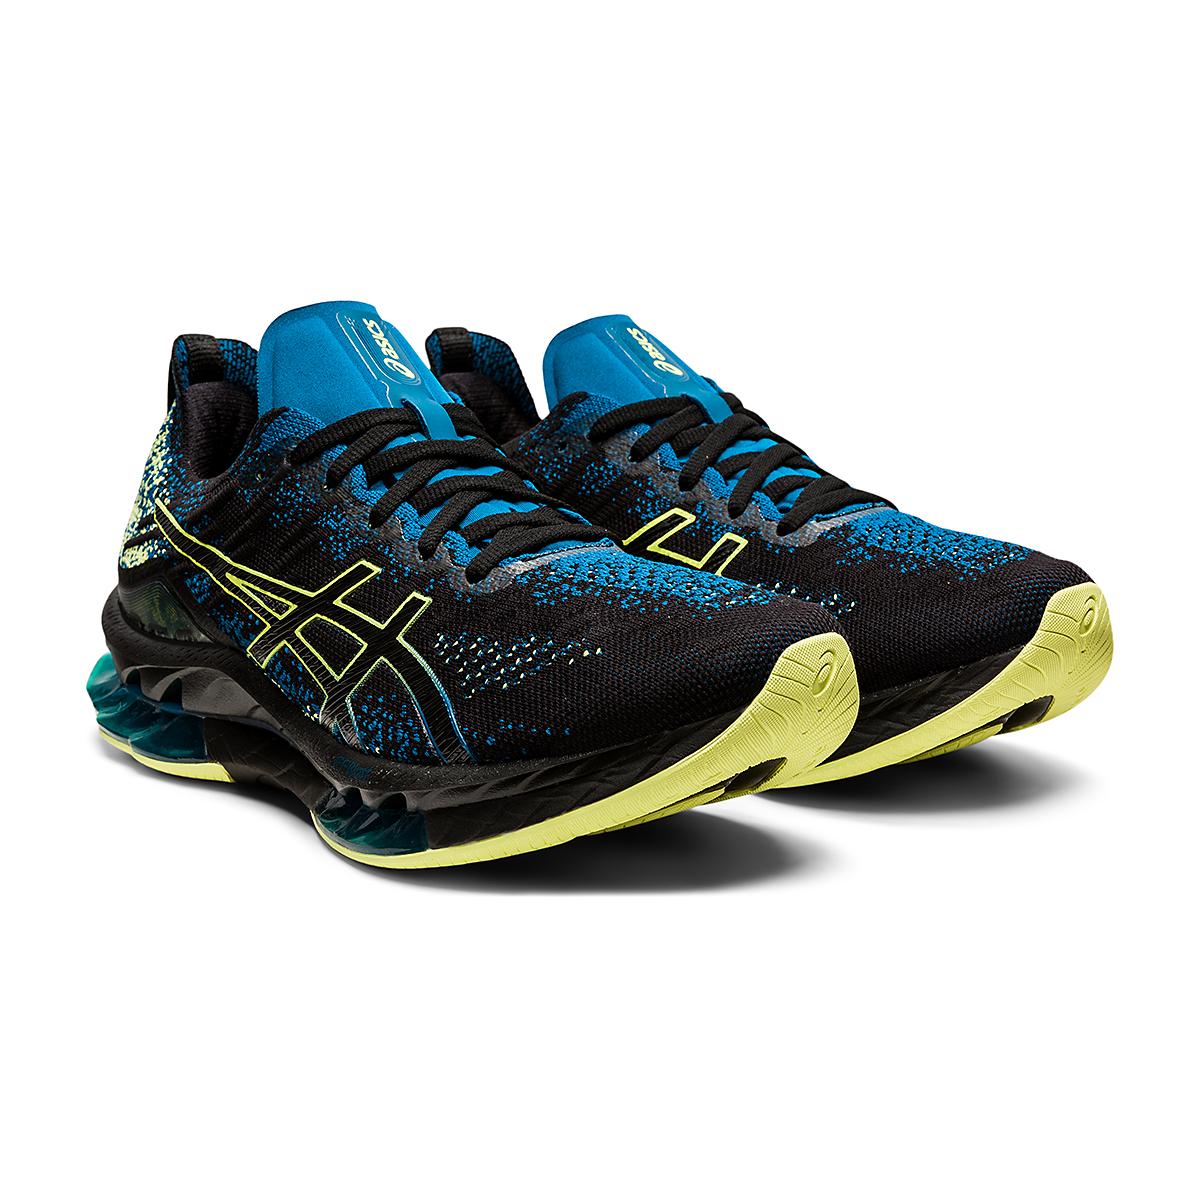 Men's Asics Kinsei Blast Running Shoe - Color: Black/Glow Yellow - Size: 6 - Width: Regular, Black/Glow Yellow, large, image 3